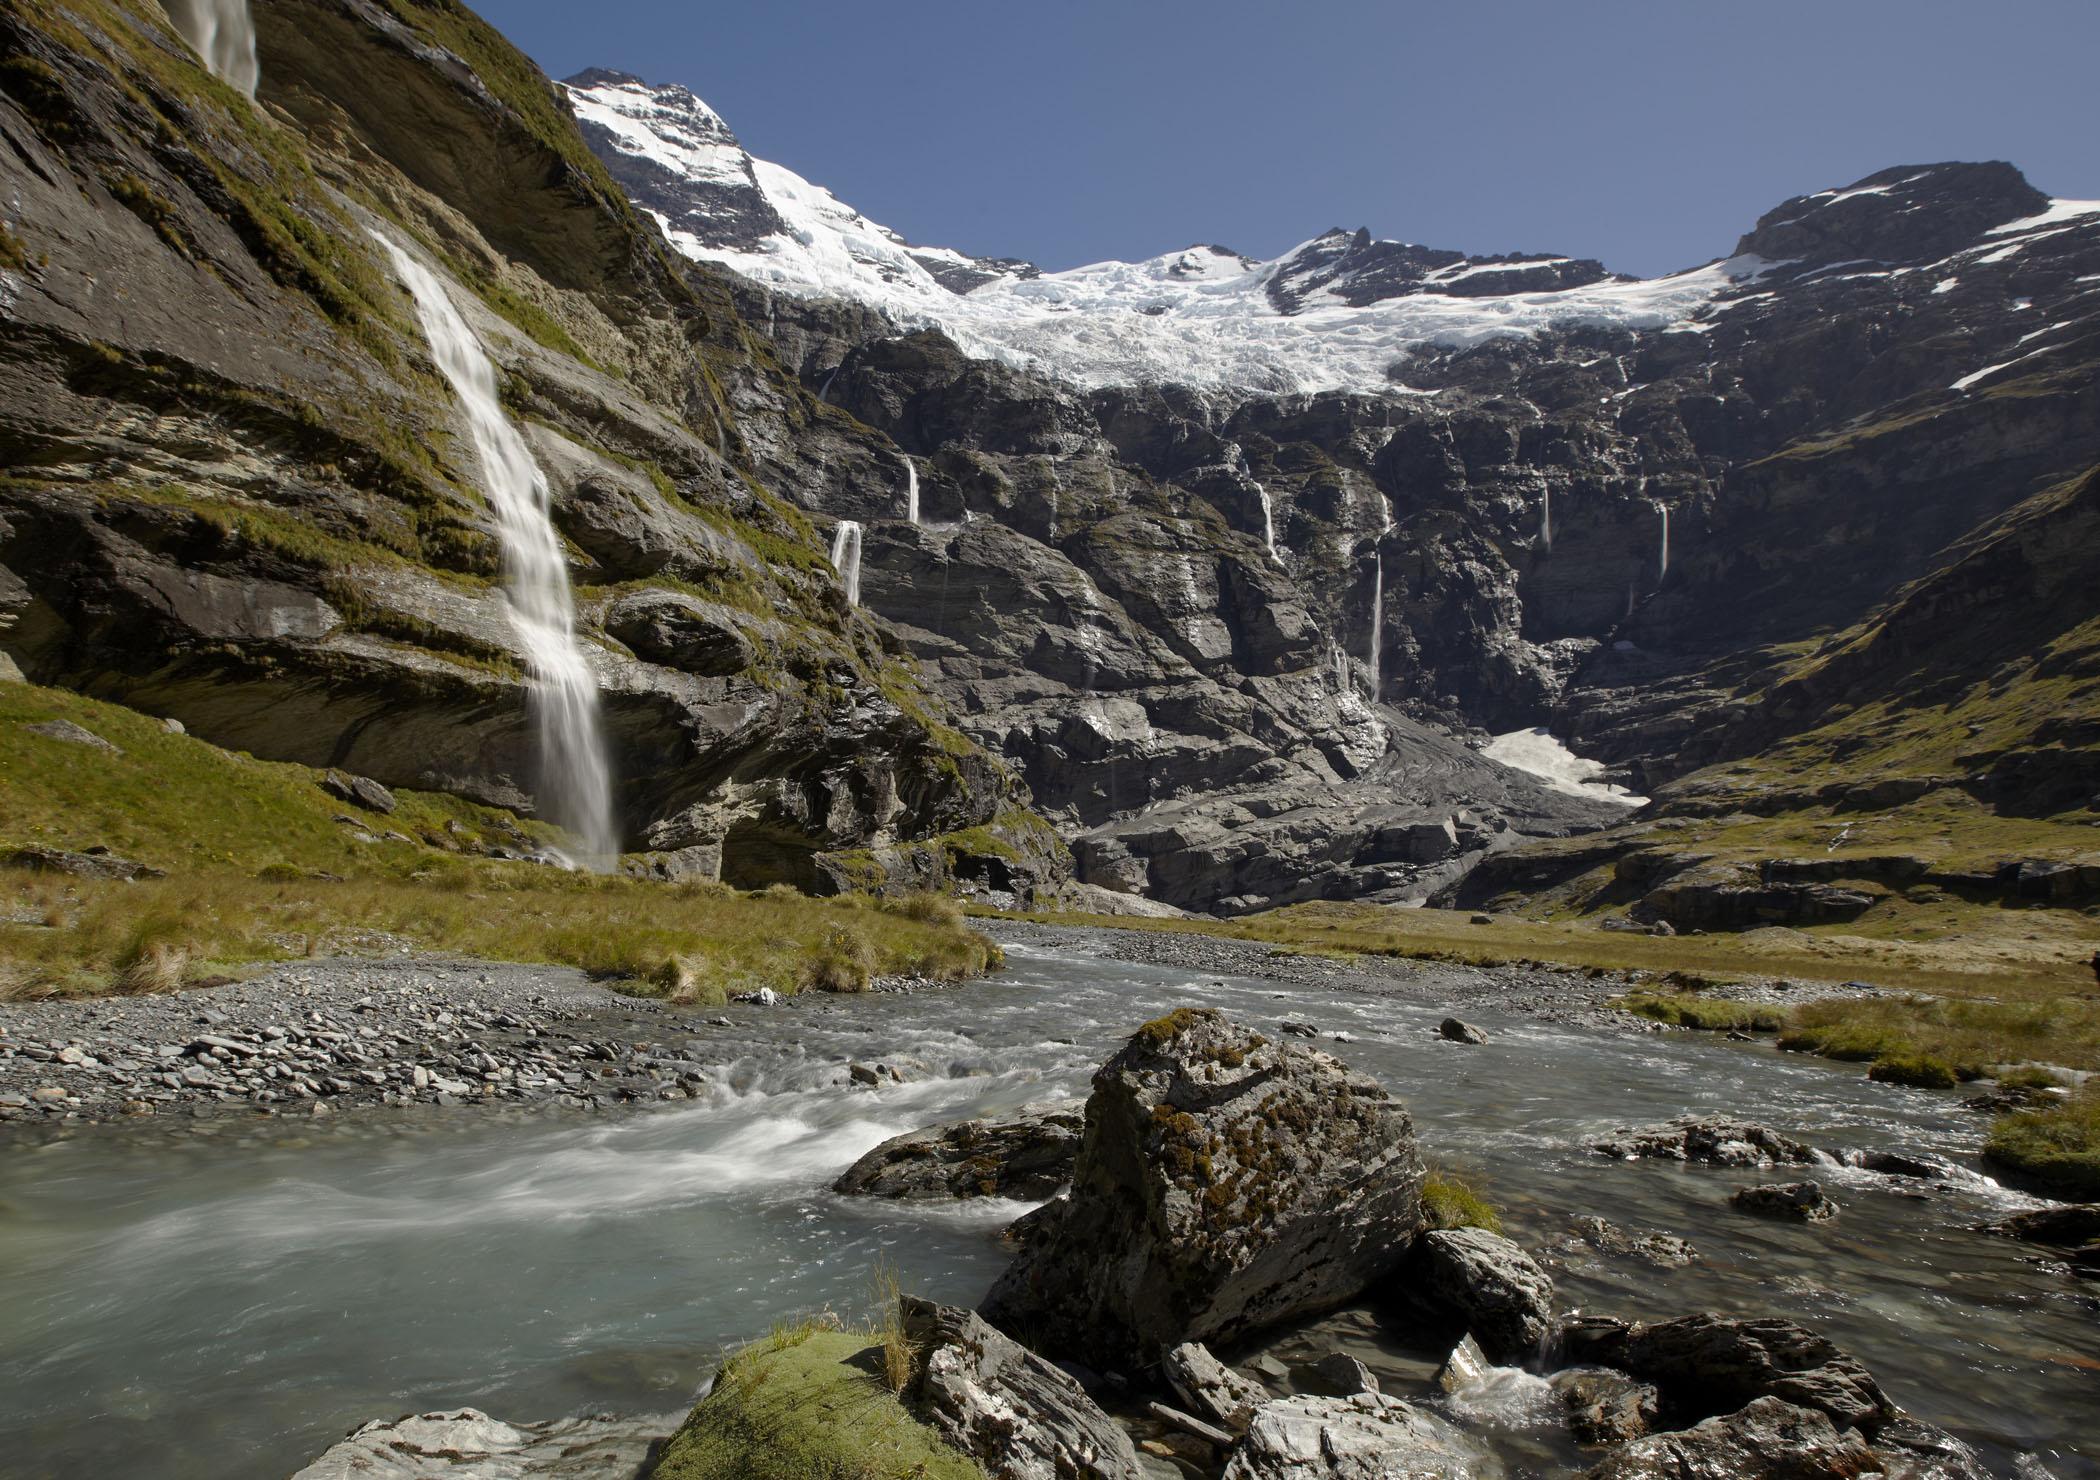 Waterfalls from the Earnslaw Burn glacier